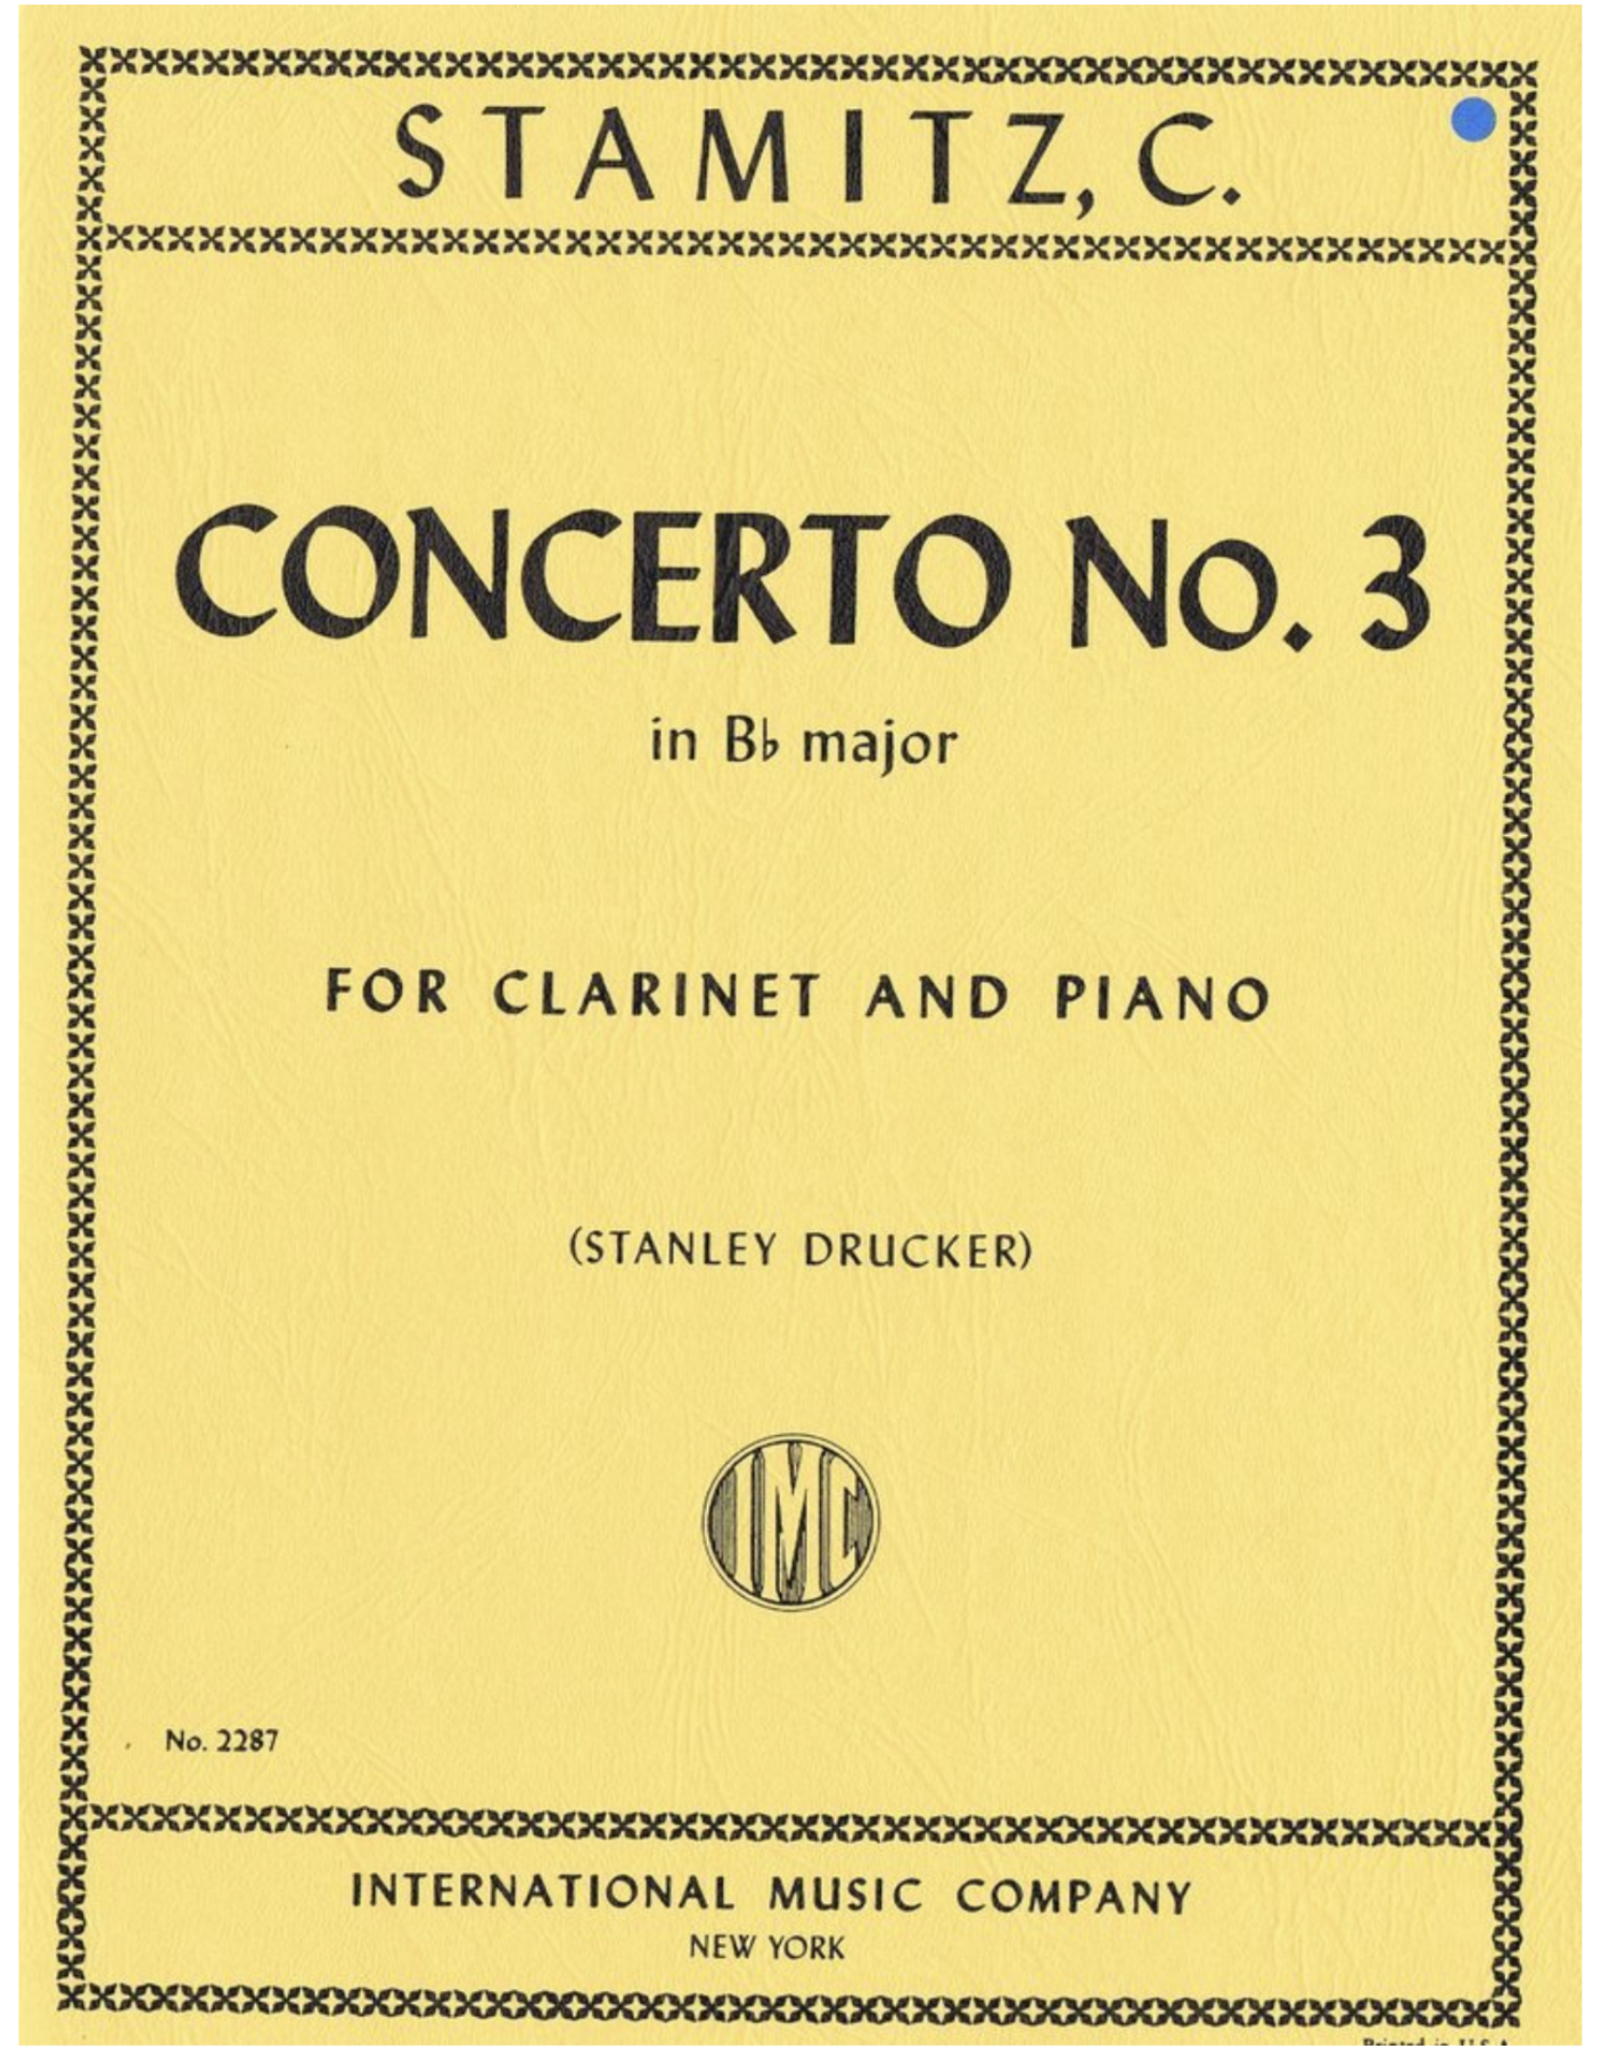 International Stamitz - Concerto No. 3 in Bb Major Clarinet and Piano IMC No. 2287